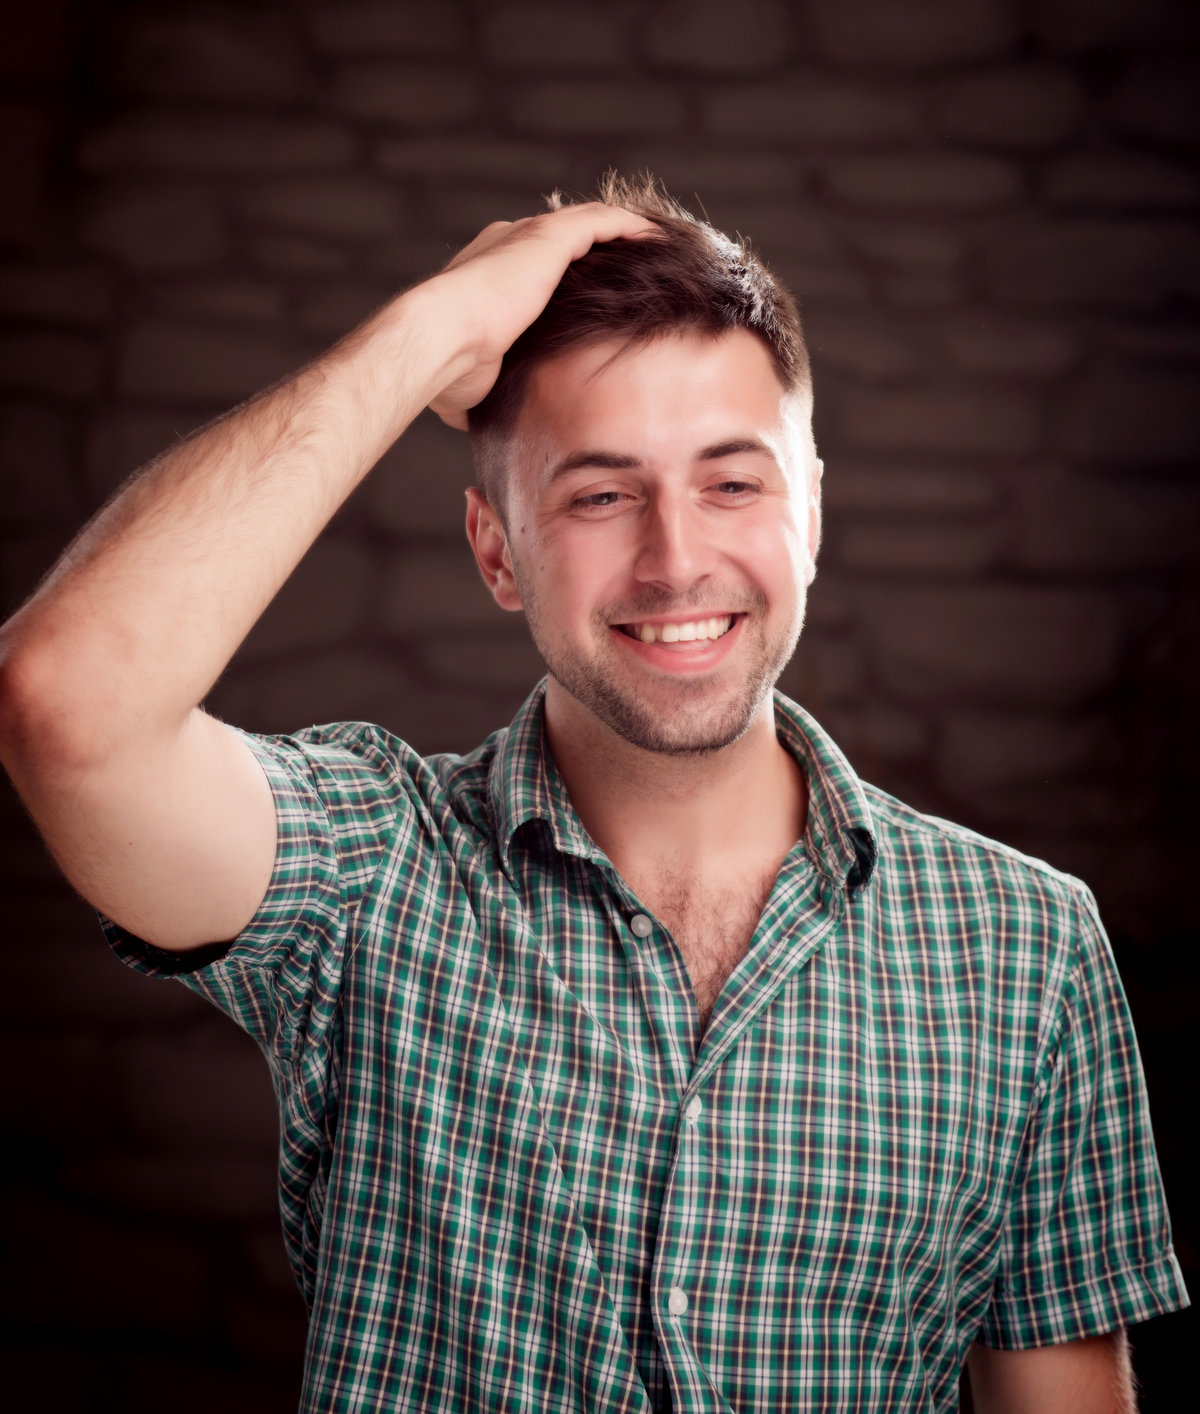 Фотосессии мужчин в домашних условиях